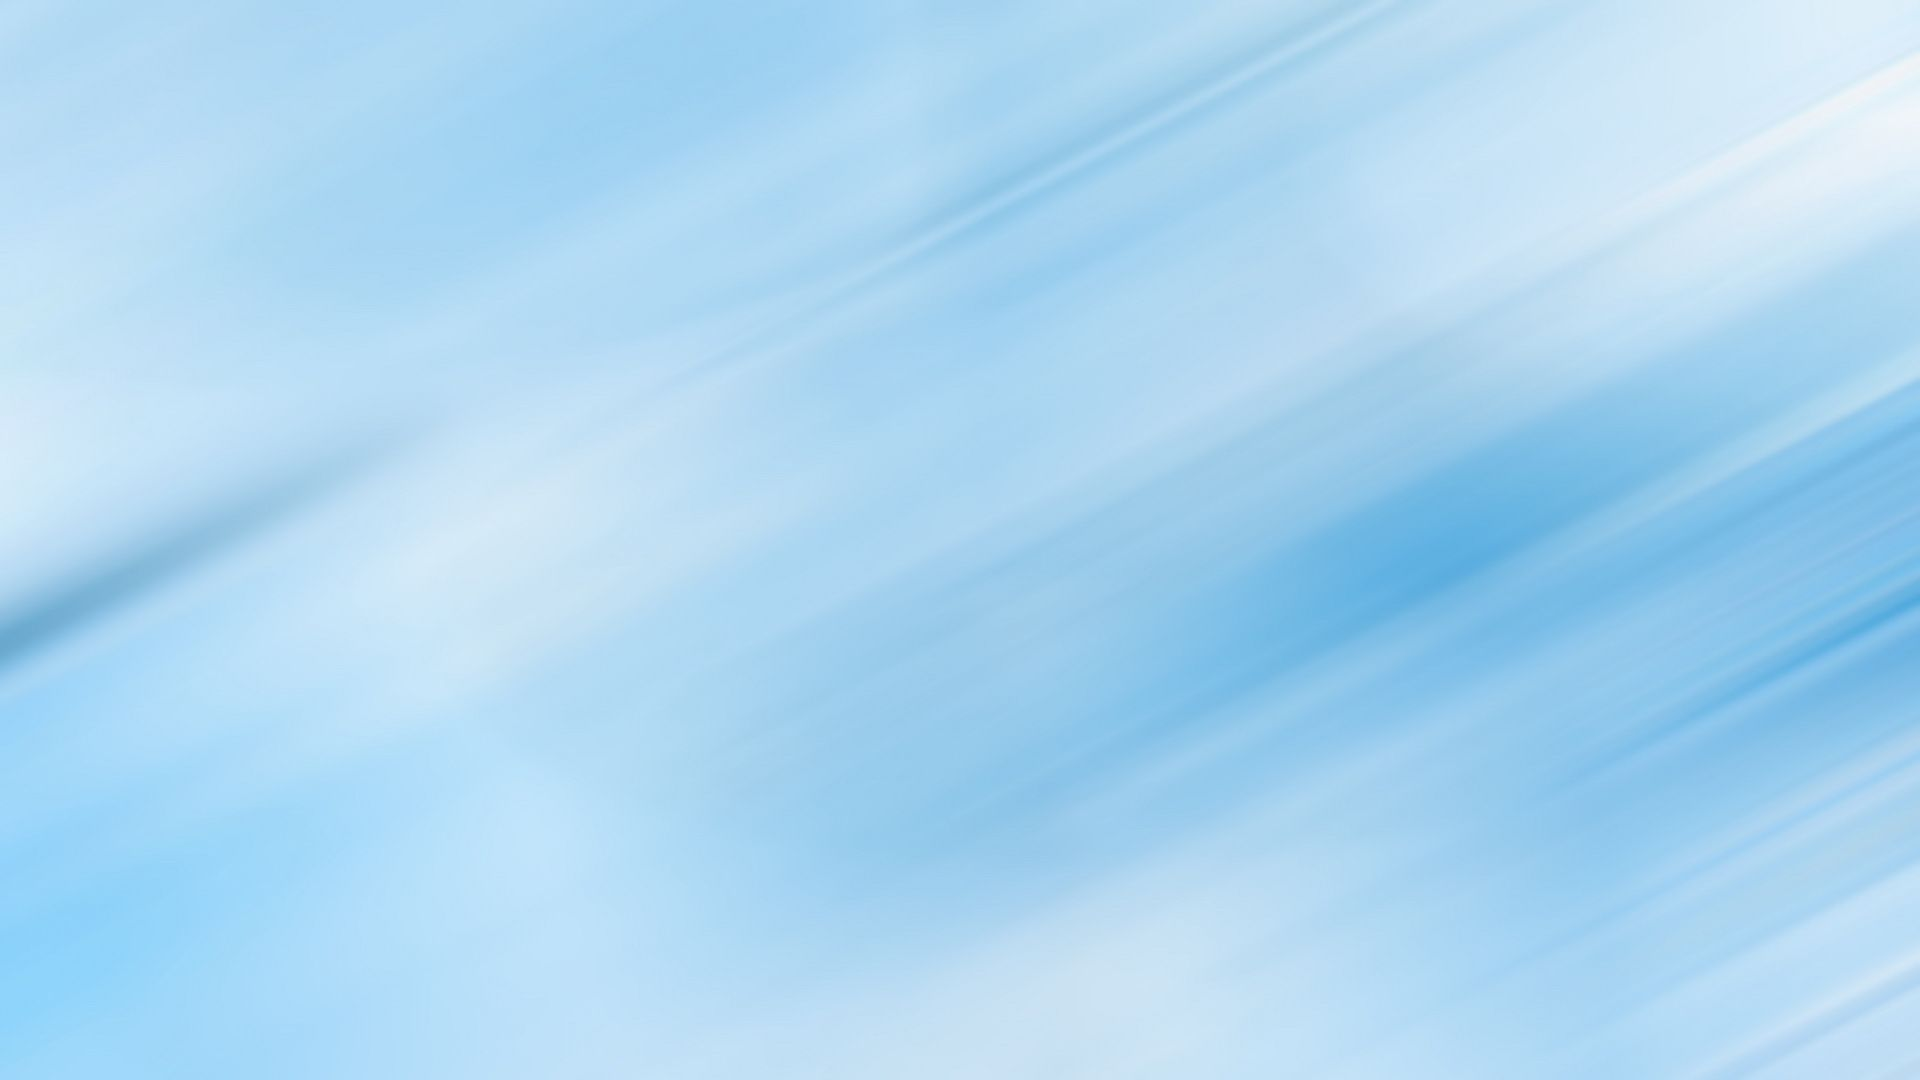 Sky Blue Background Wallpaper Blue Background Wallpapers Blue Background Images Blue Sky Wallpaper